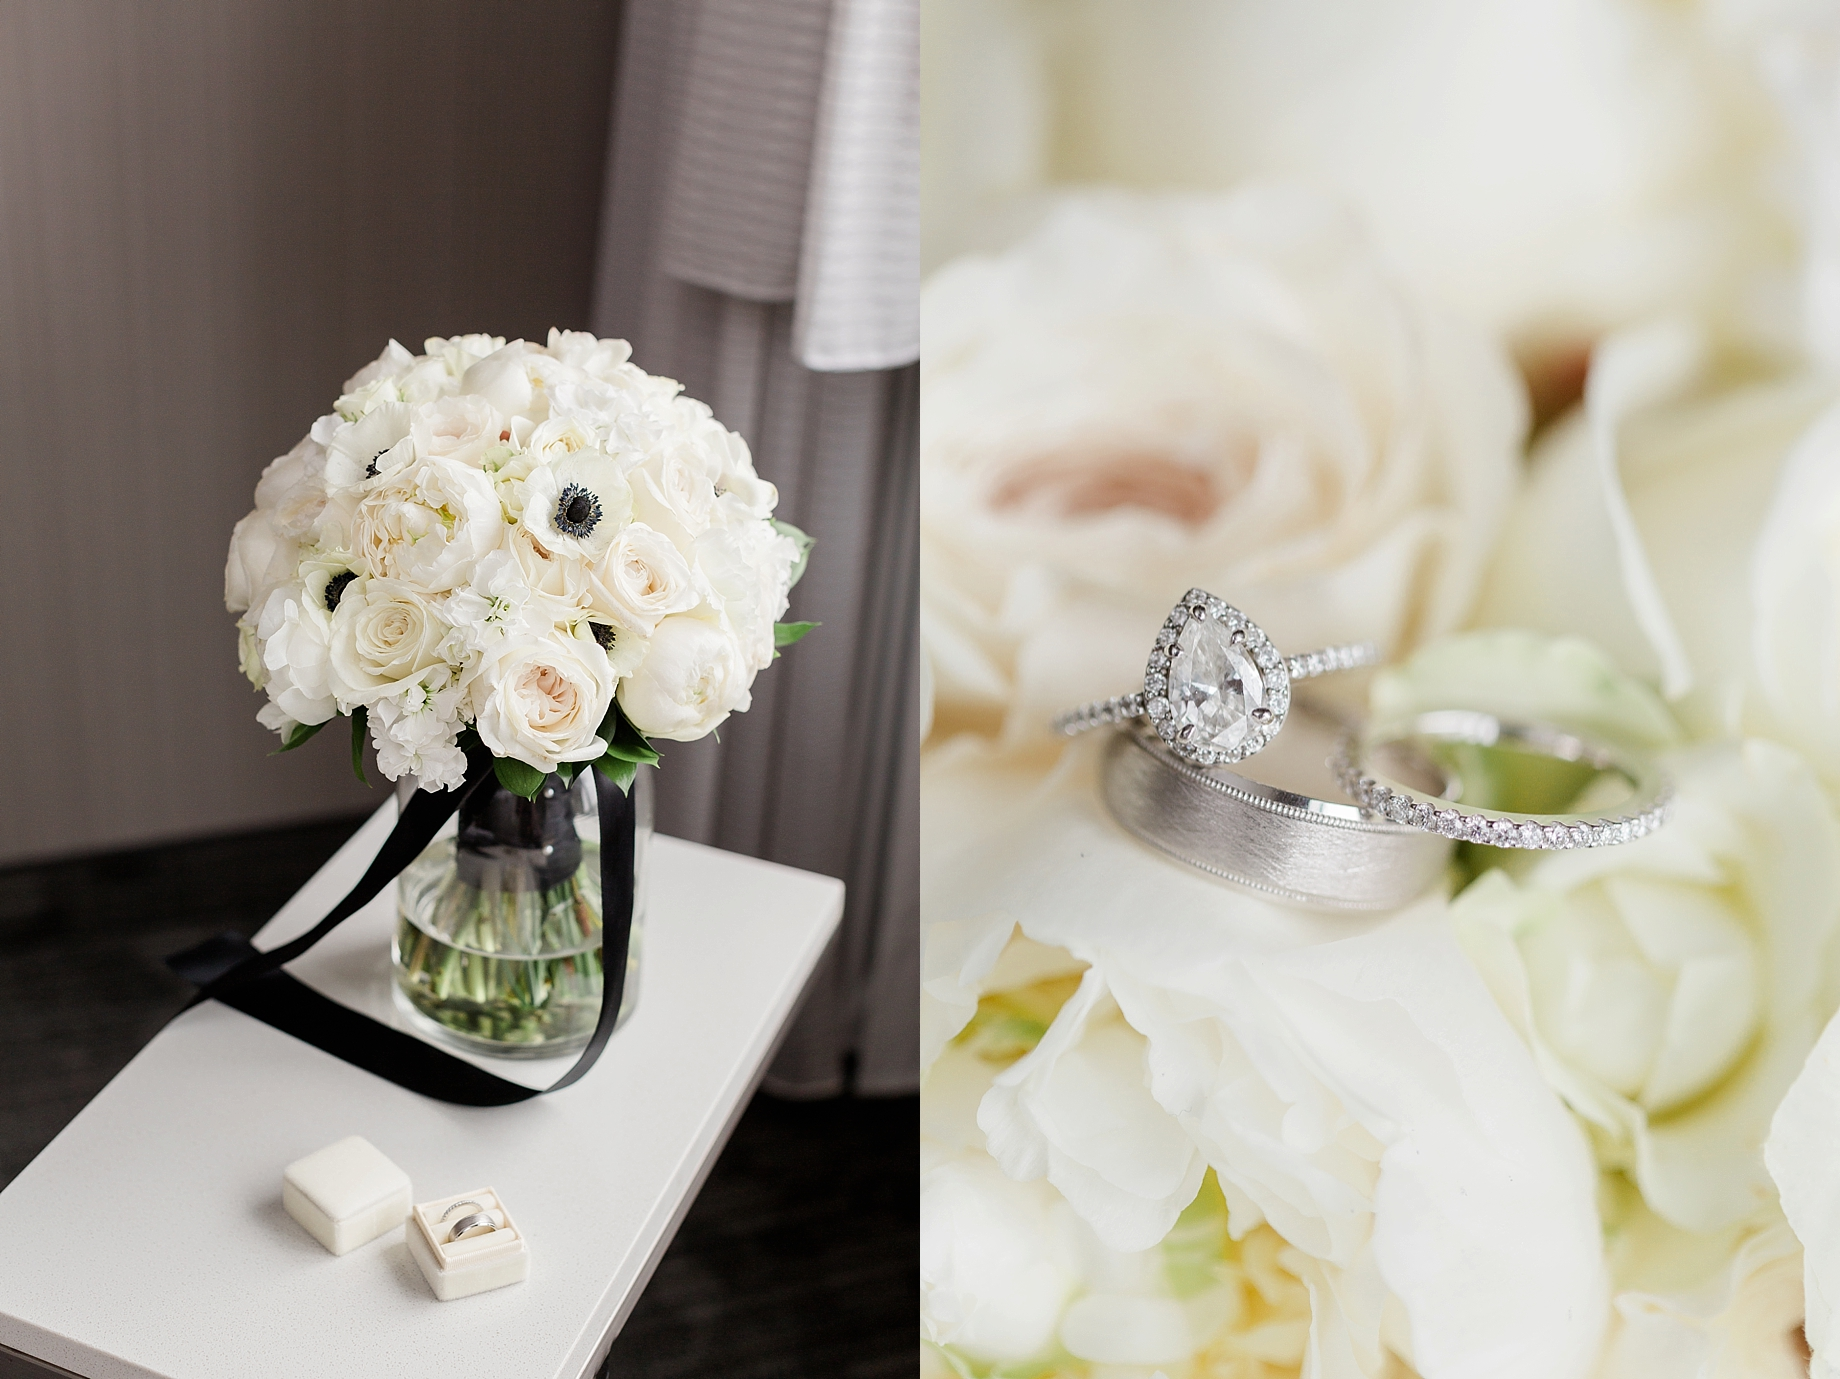 All white bridal bouquet by The William Penn Inn Flower Shop   William Penn Inn Wedding